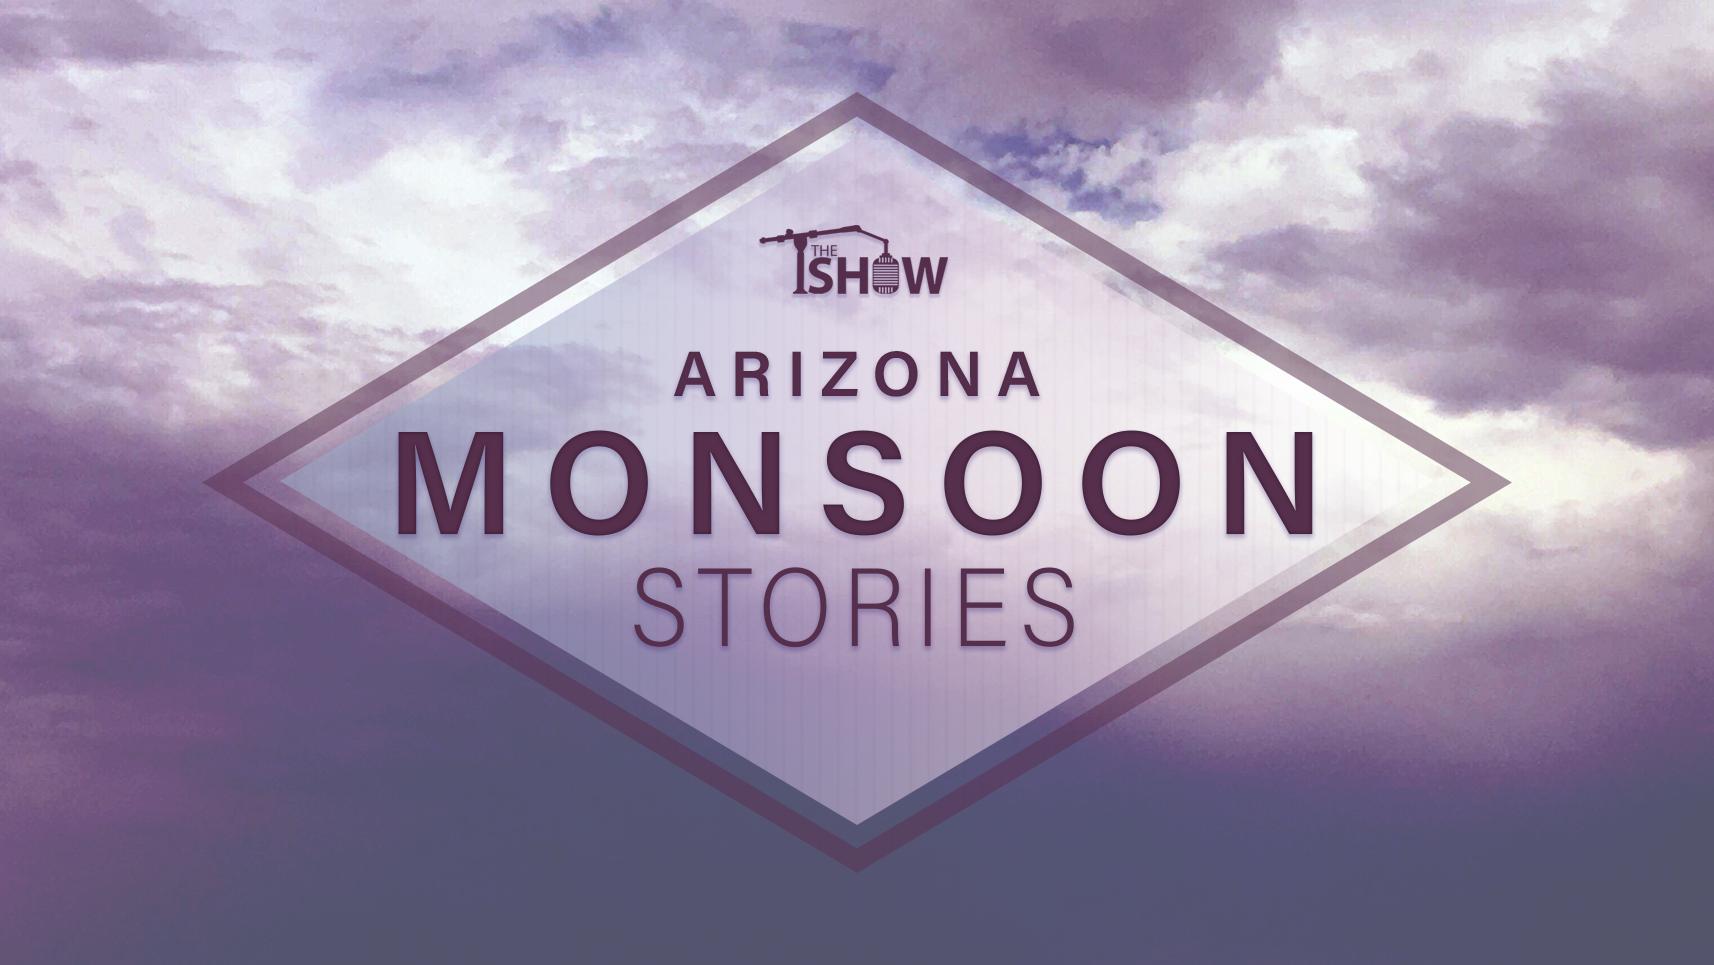 monsoon stories 2019